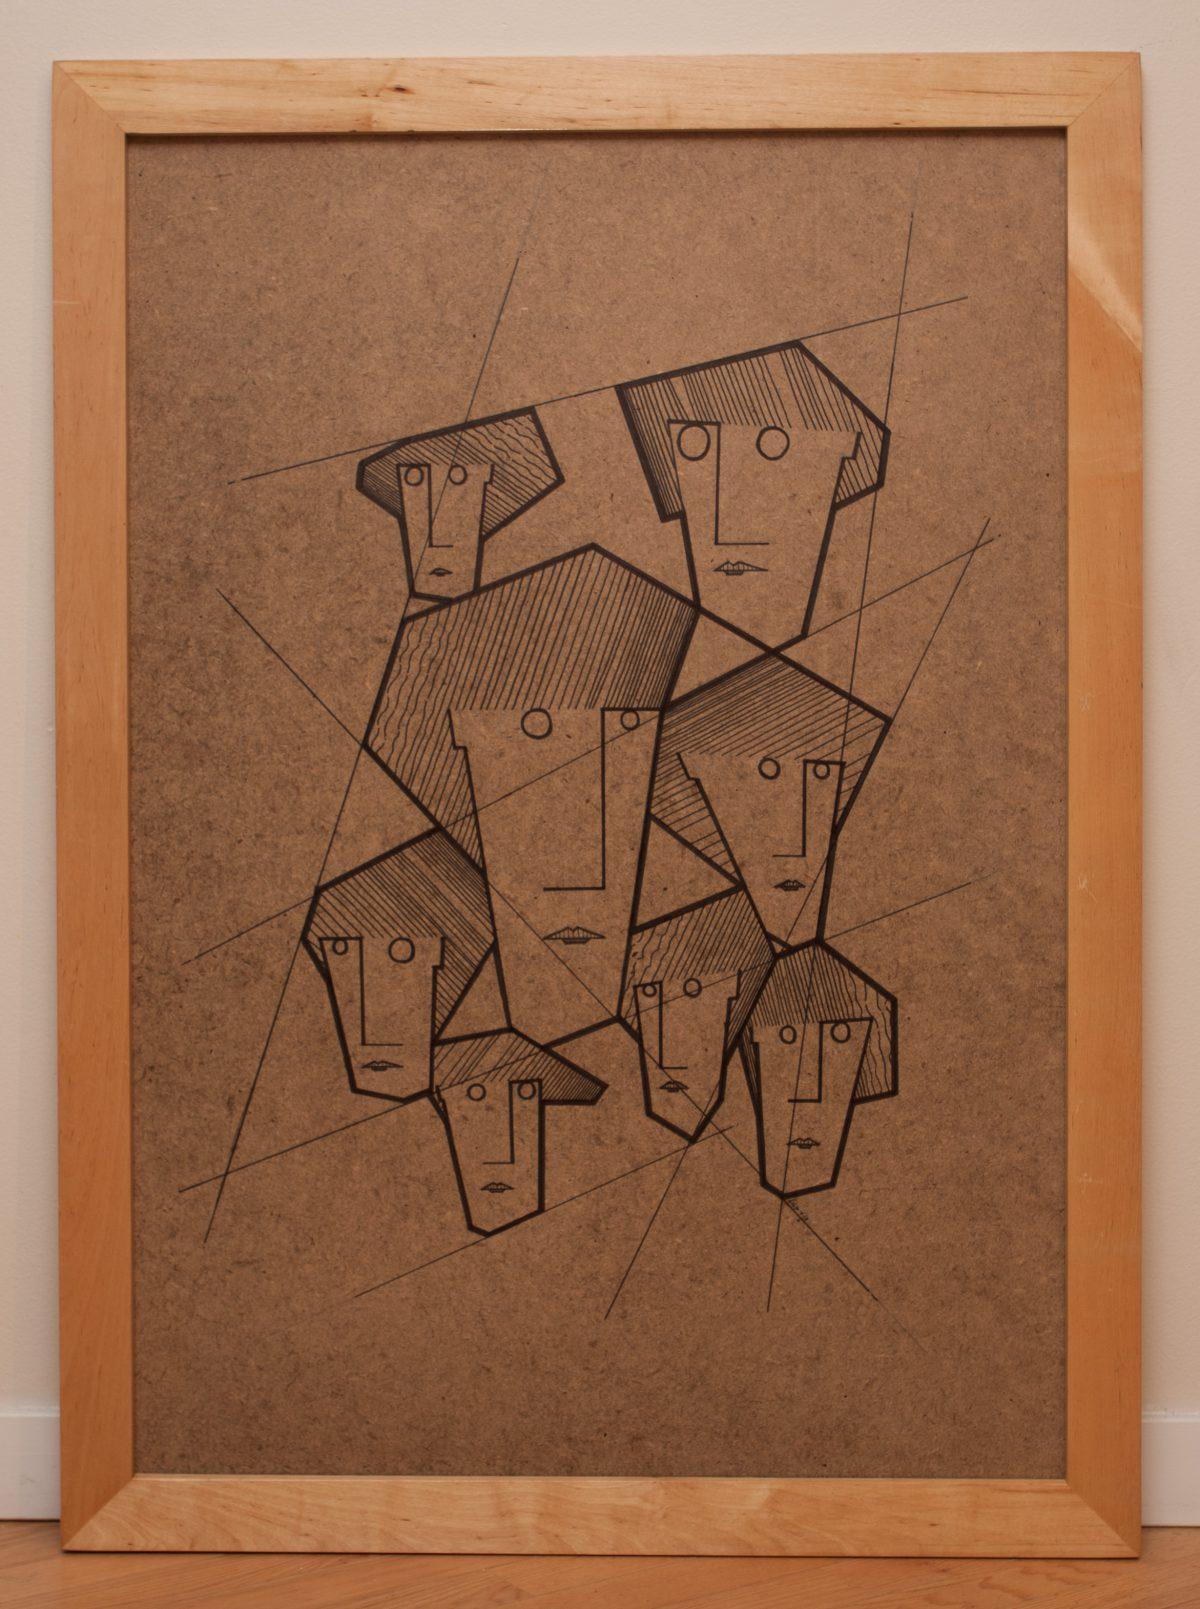 Eight Sisters 1/3 - 70x100cm, pen on fibreboard, ch3, pen, wood, illustration, frame